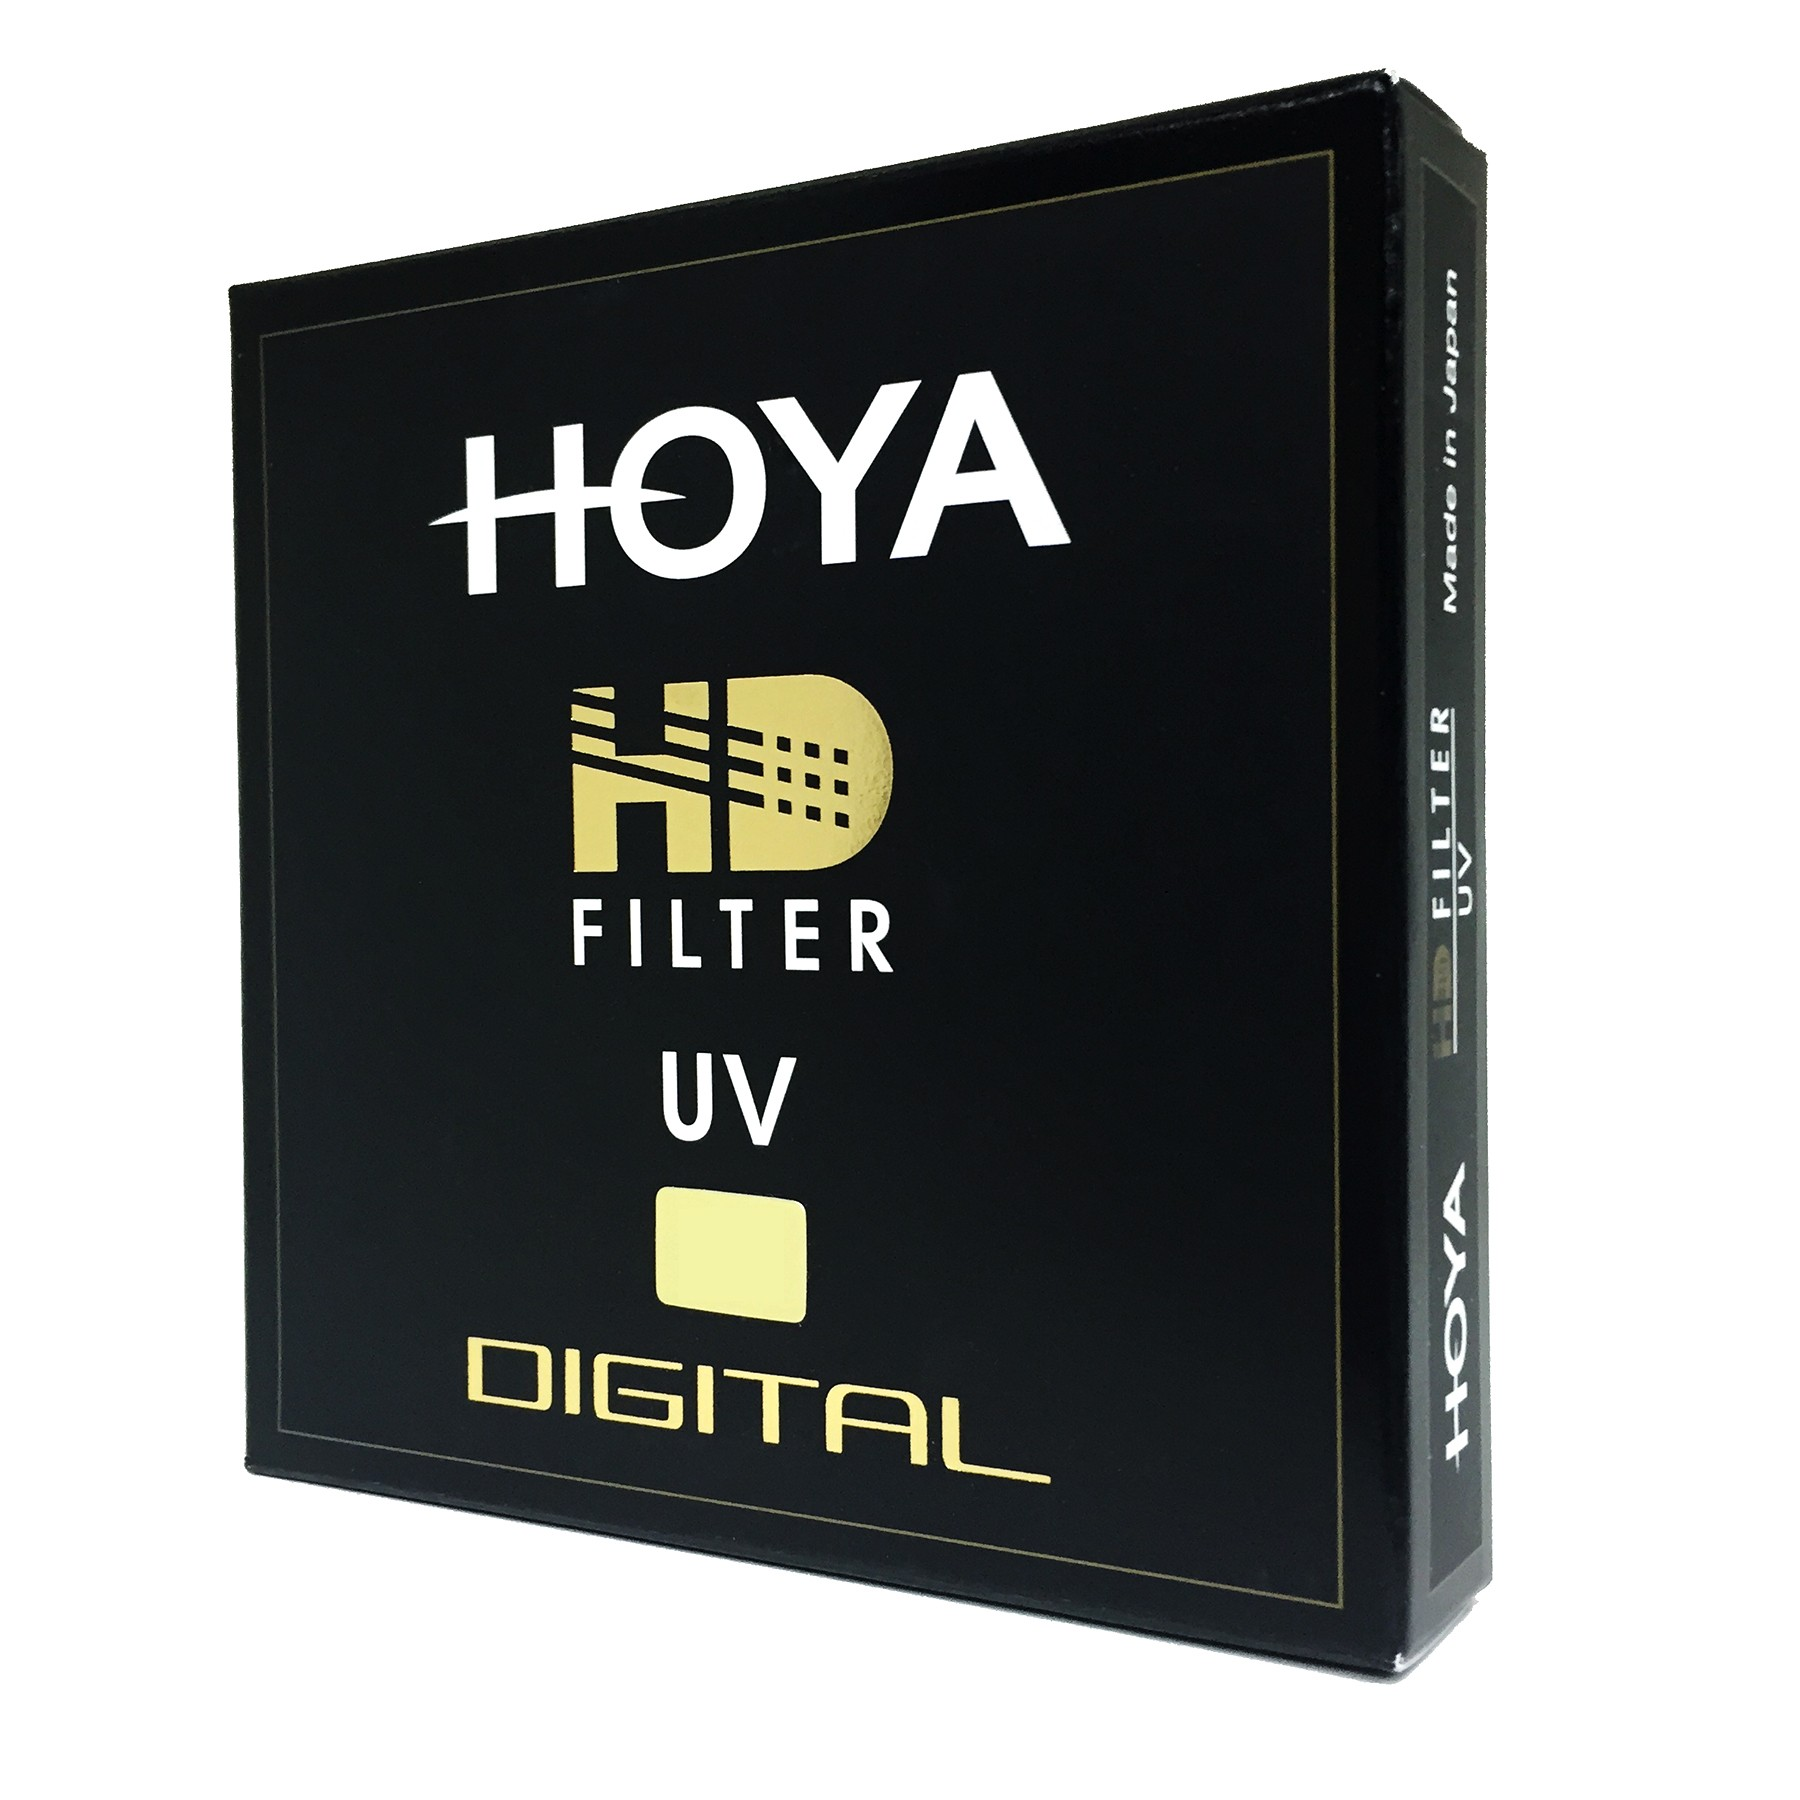 Hoya HD 72mm UV